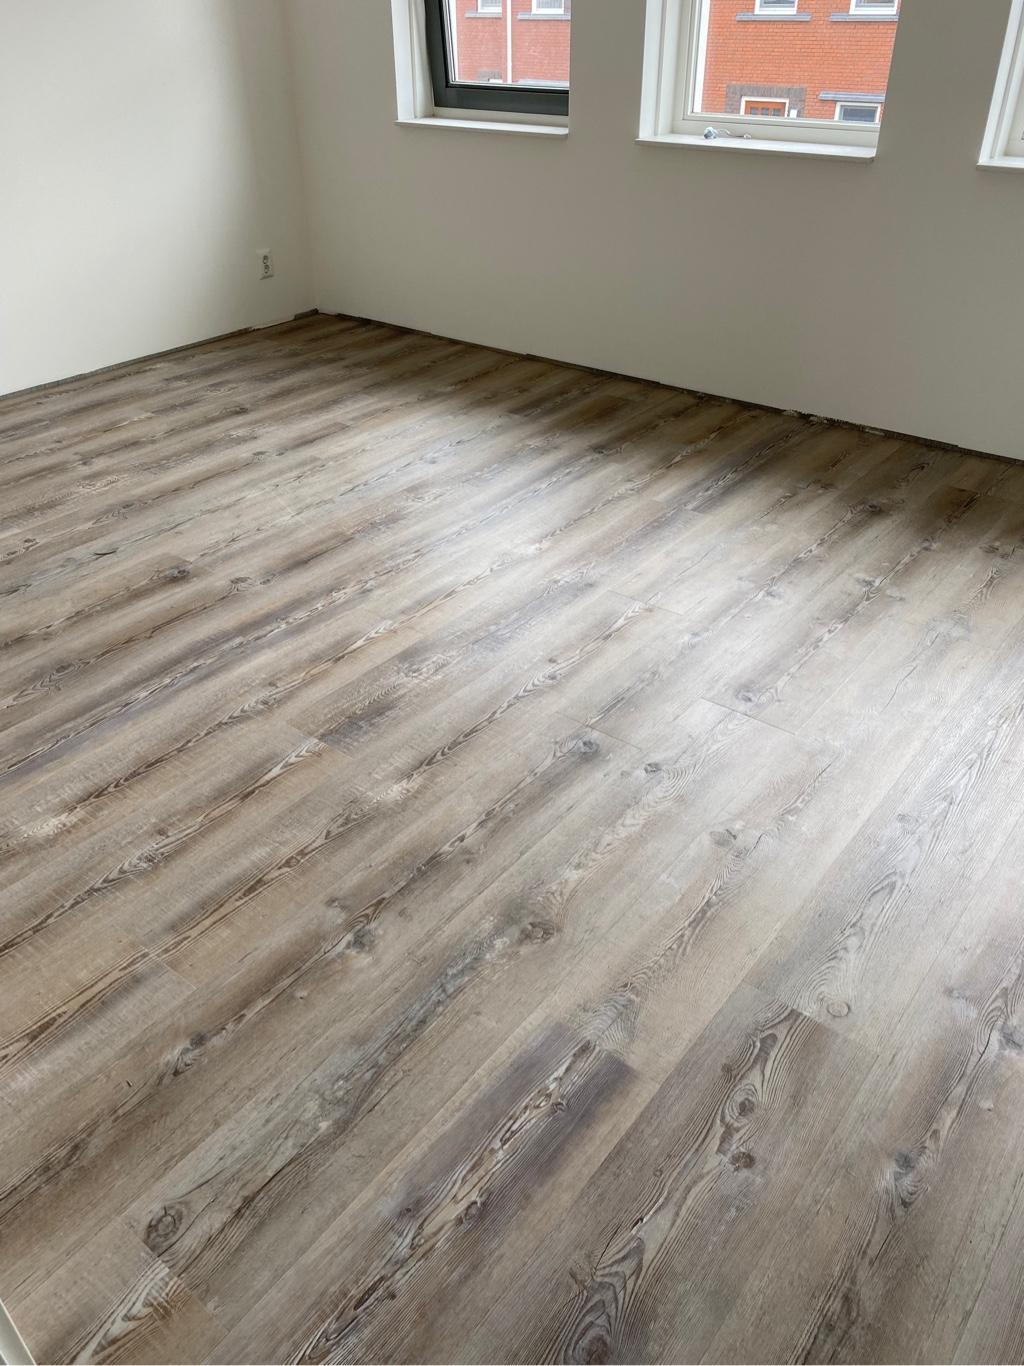 77 m² Merano Grey Plak-pvc te 's Gravendeel